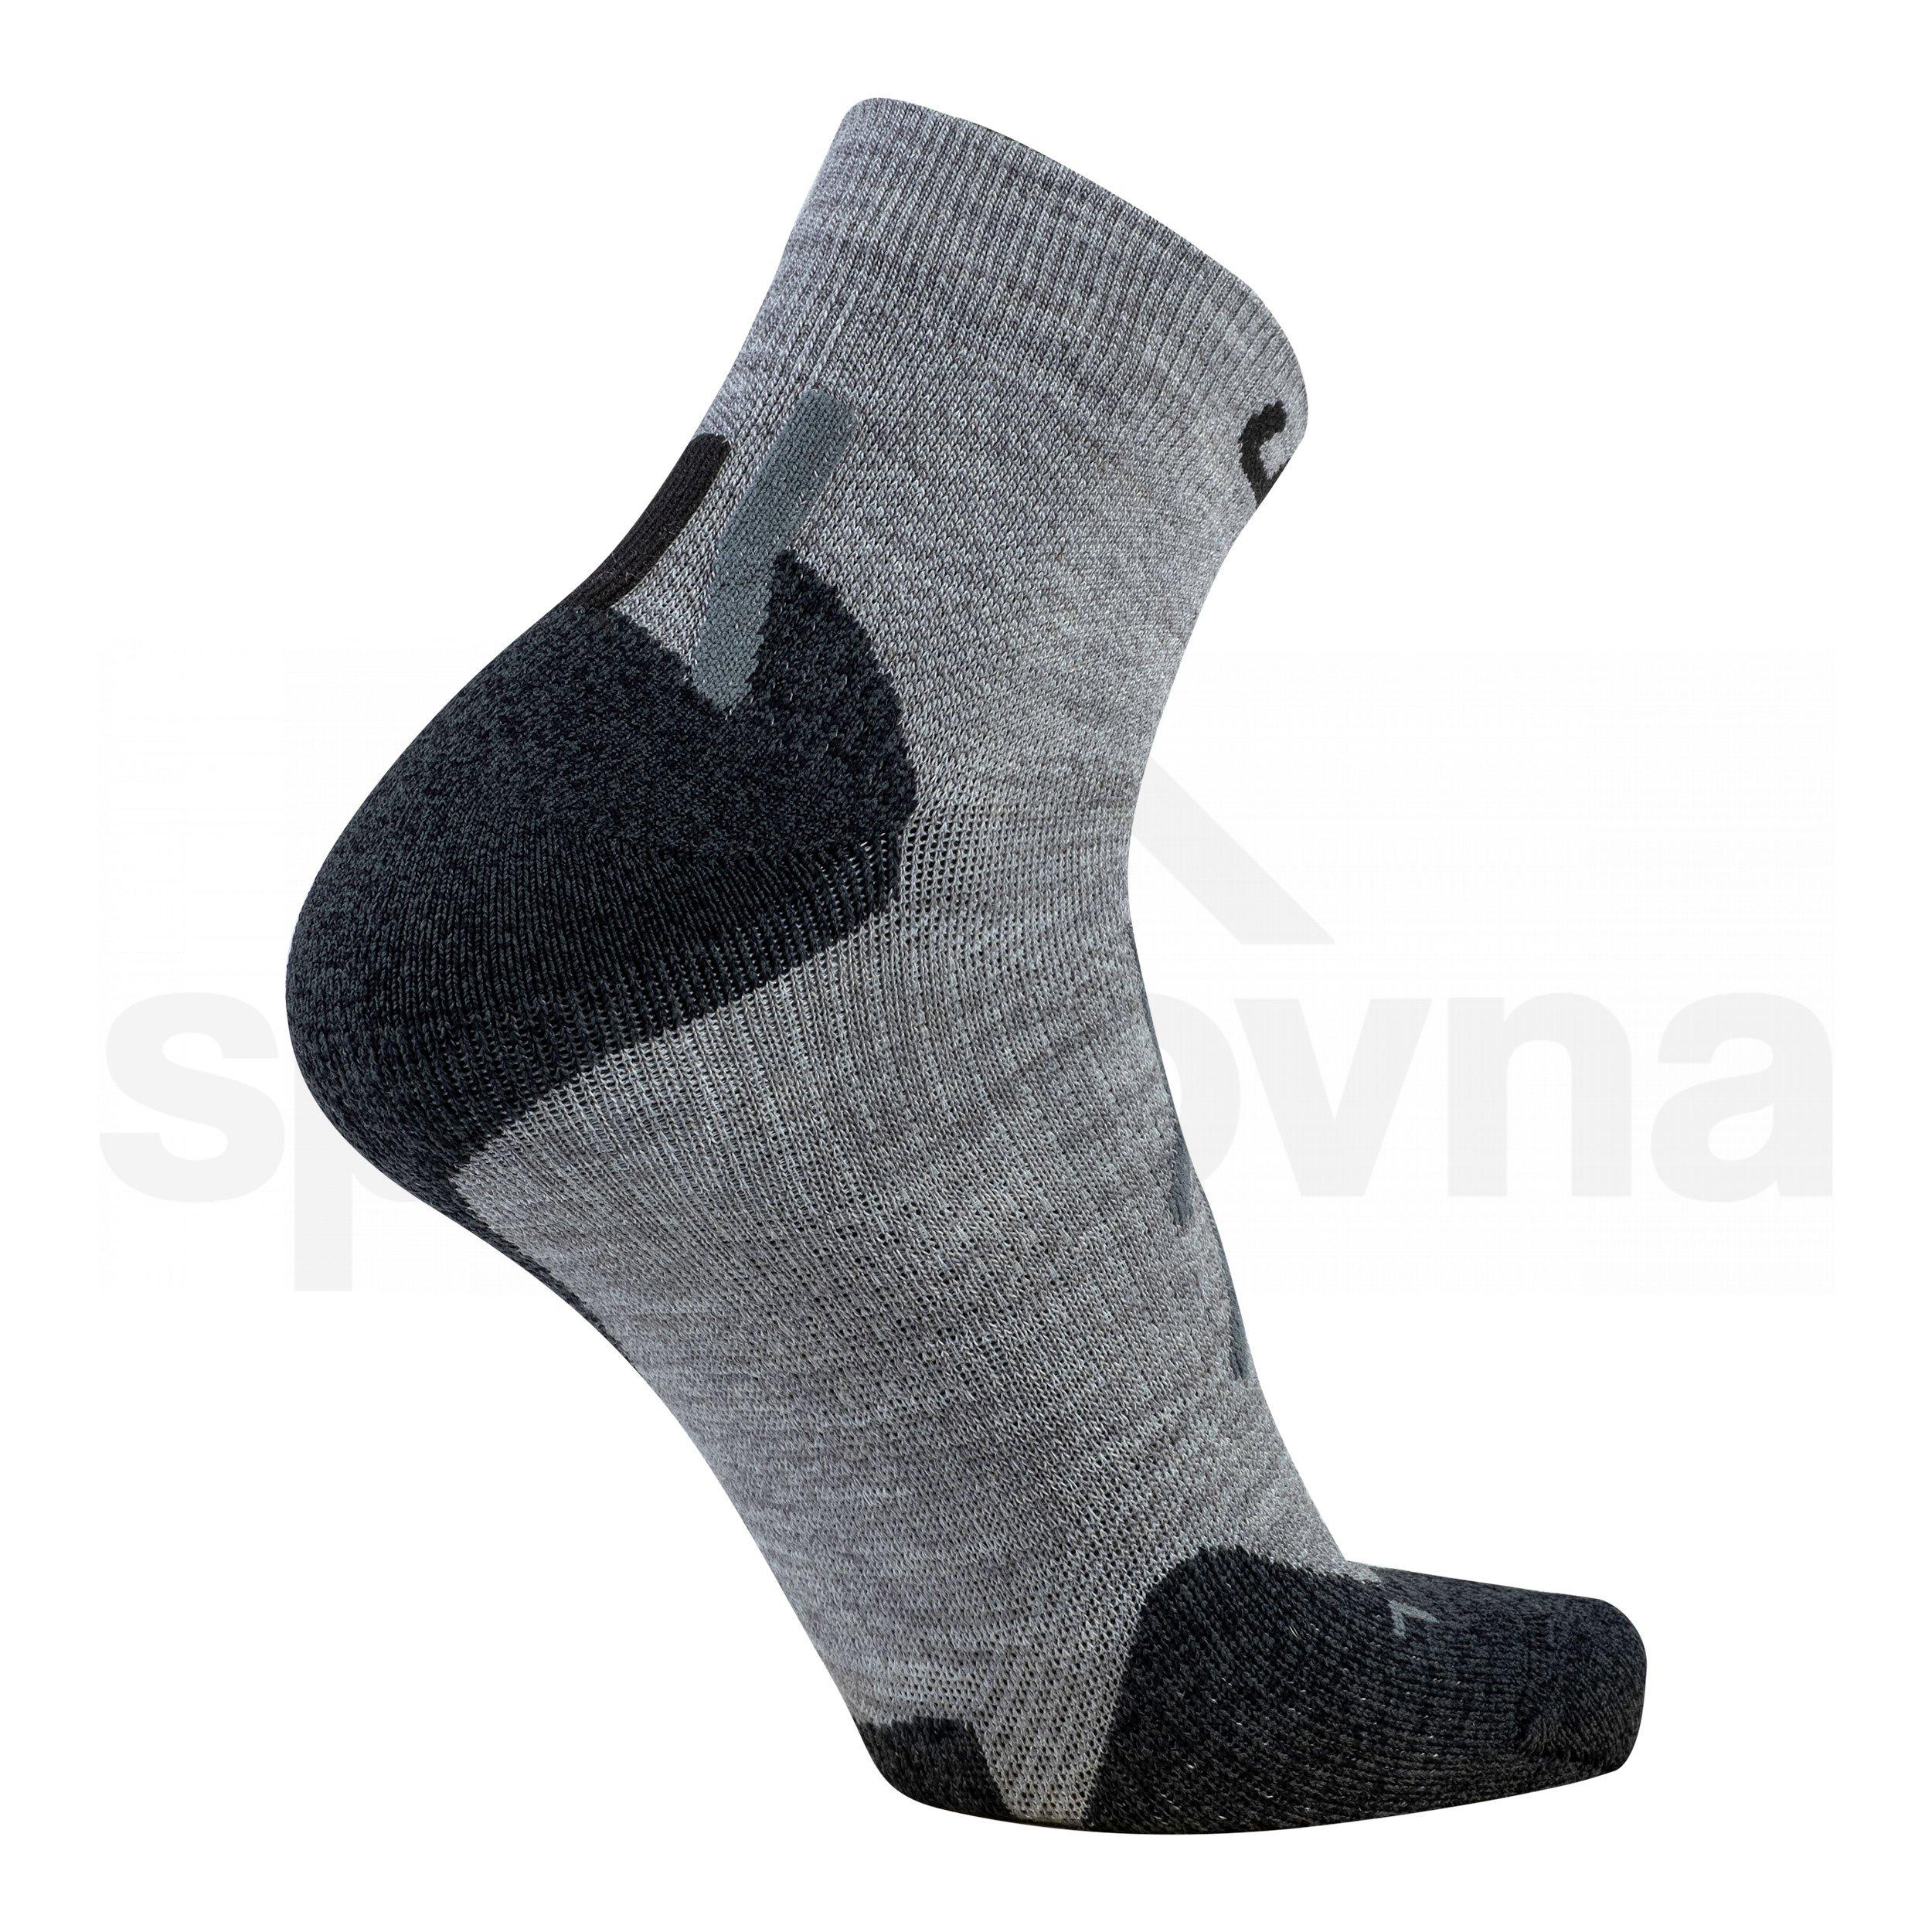 Pánské ponožky UYN TREKKING APPROACH MERINO LOW CUT SOCKS - šedá